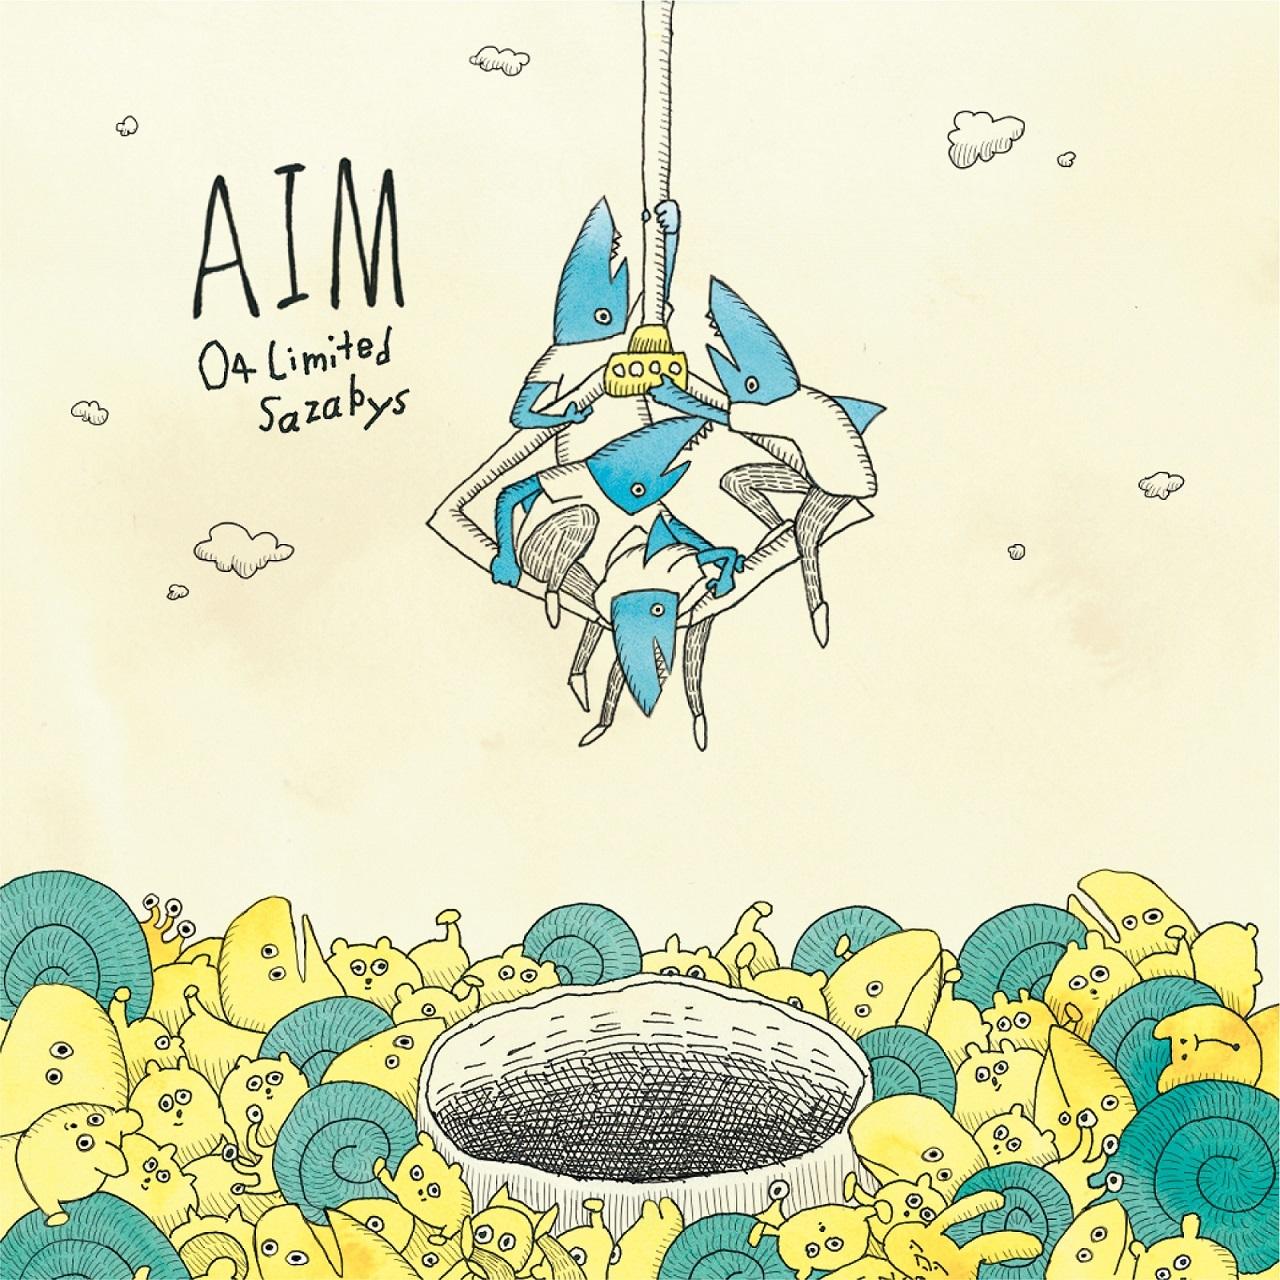 04 Limited Sazabys「AIM」初回盤